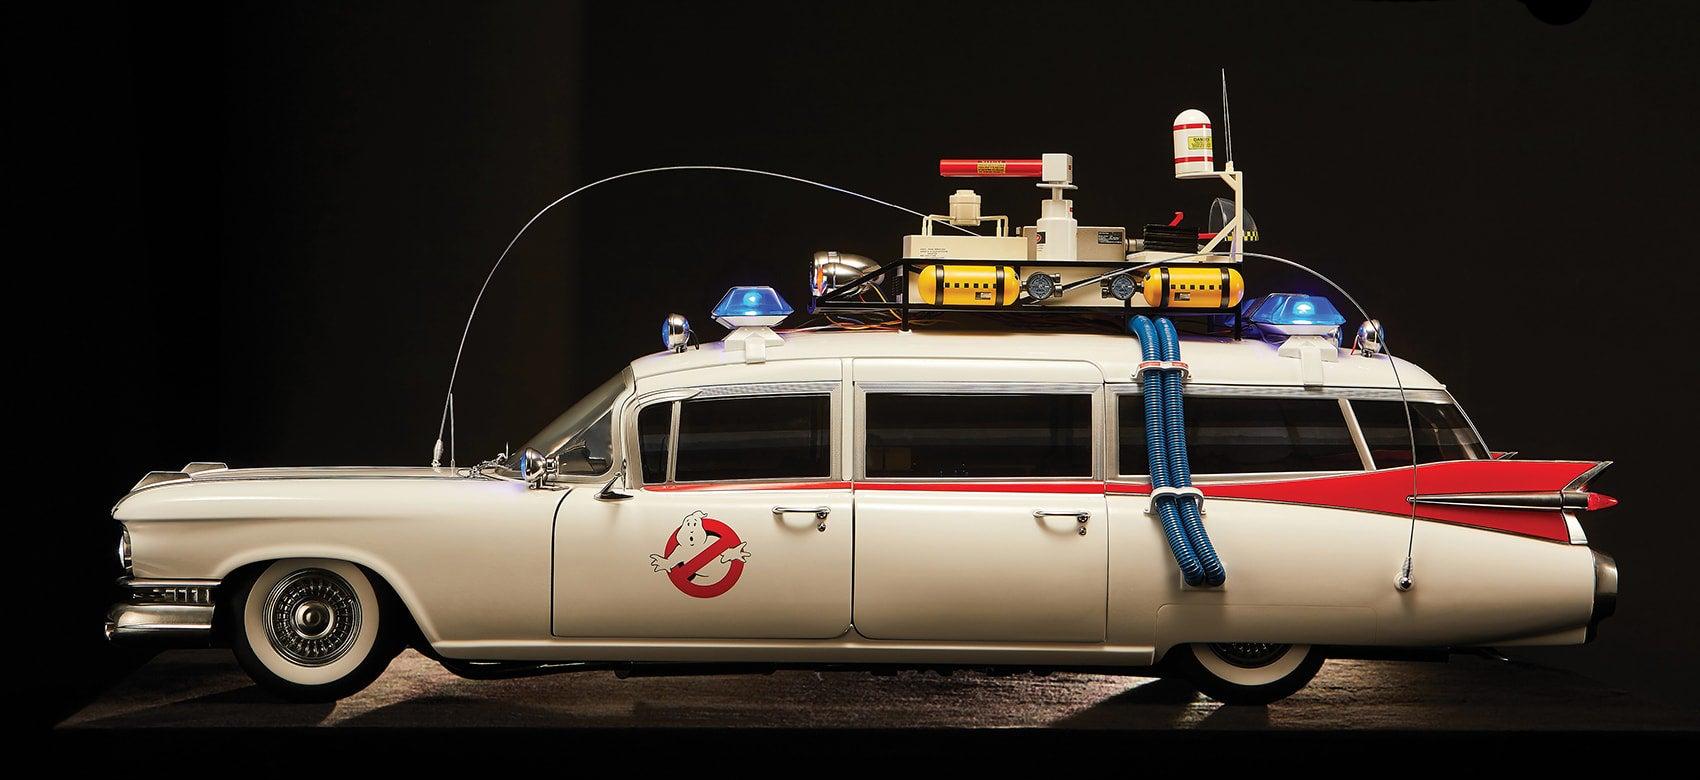 Look At This $1,400 Ghostbusters Ecto-1 Replica | Kotaku Australia